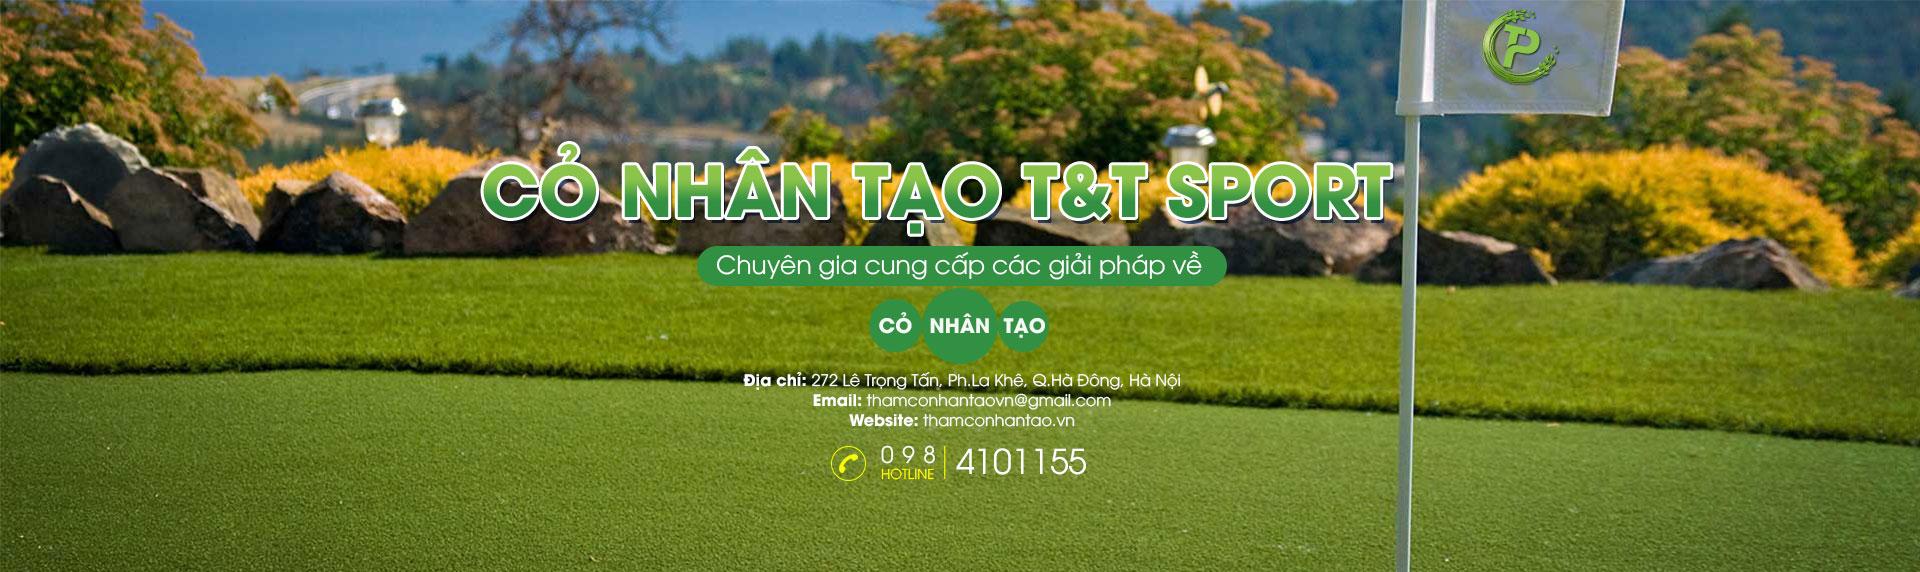 banner-co-nhan-tao-01